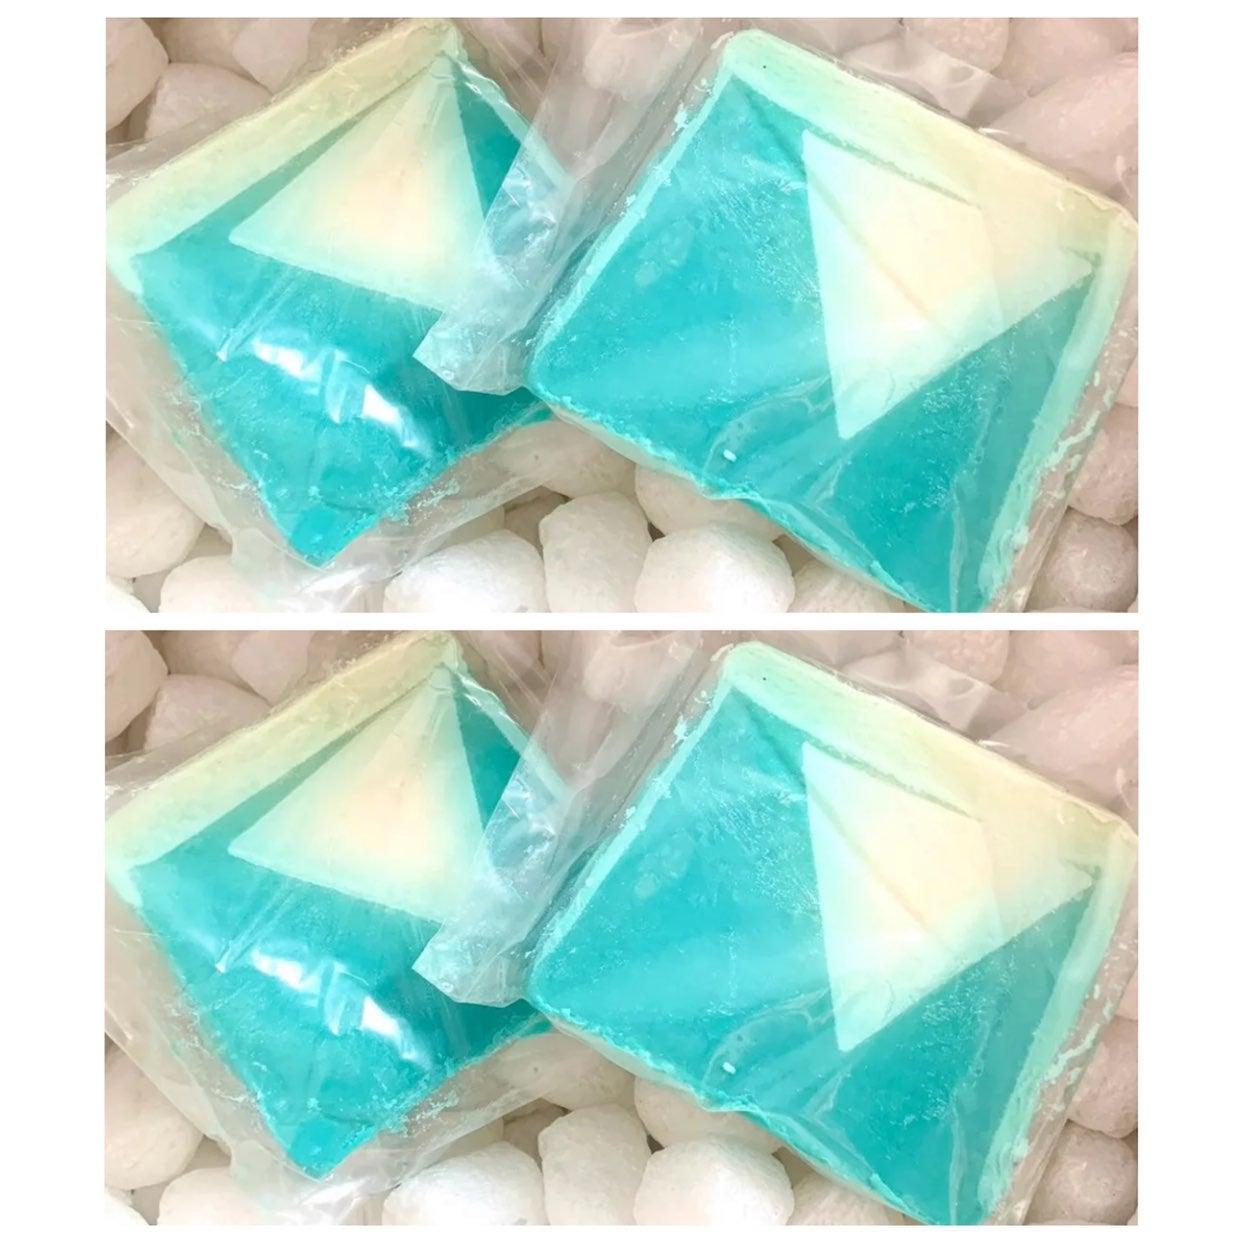 4 Lush Cosmetics snowcake soap bars